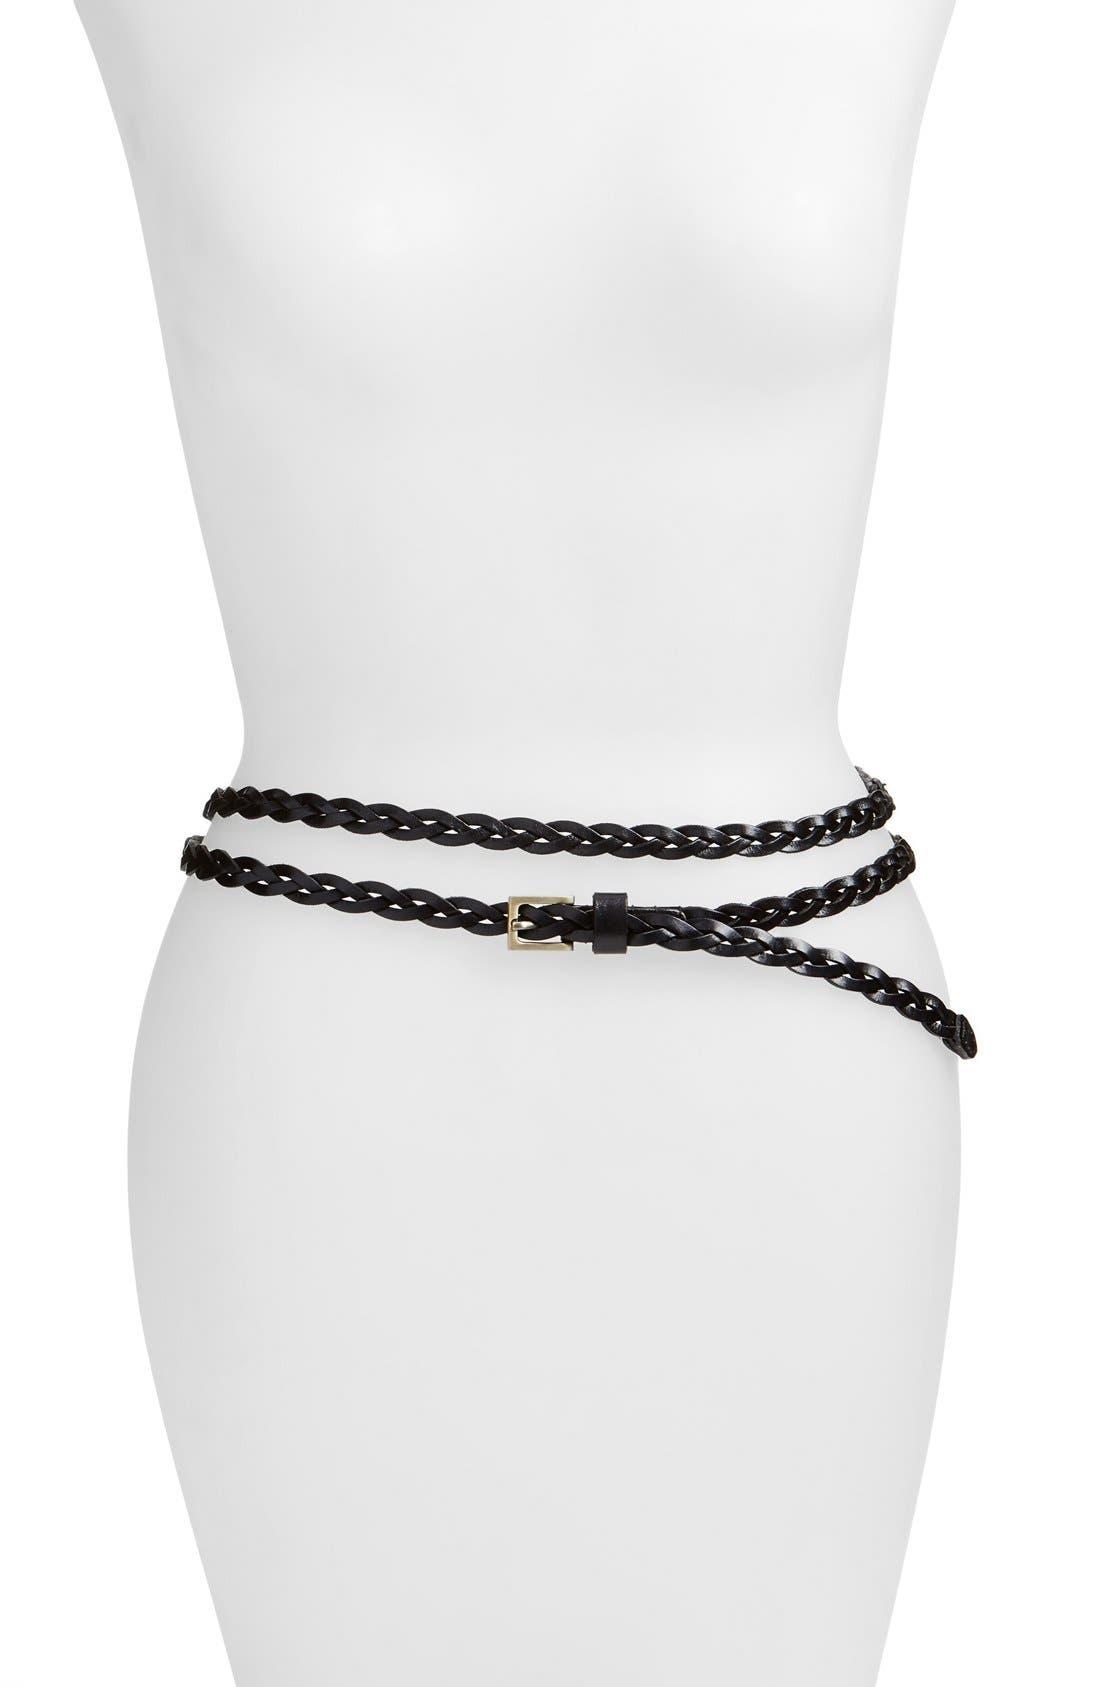 ELISE M. Florence Calfskin Leather Double Wrap Belt